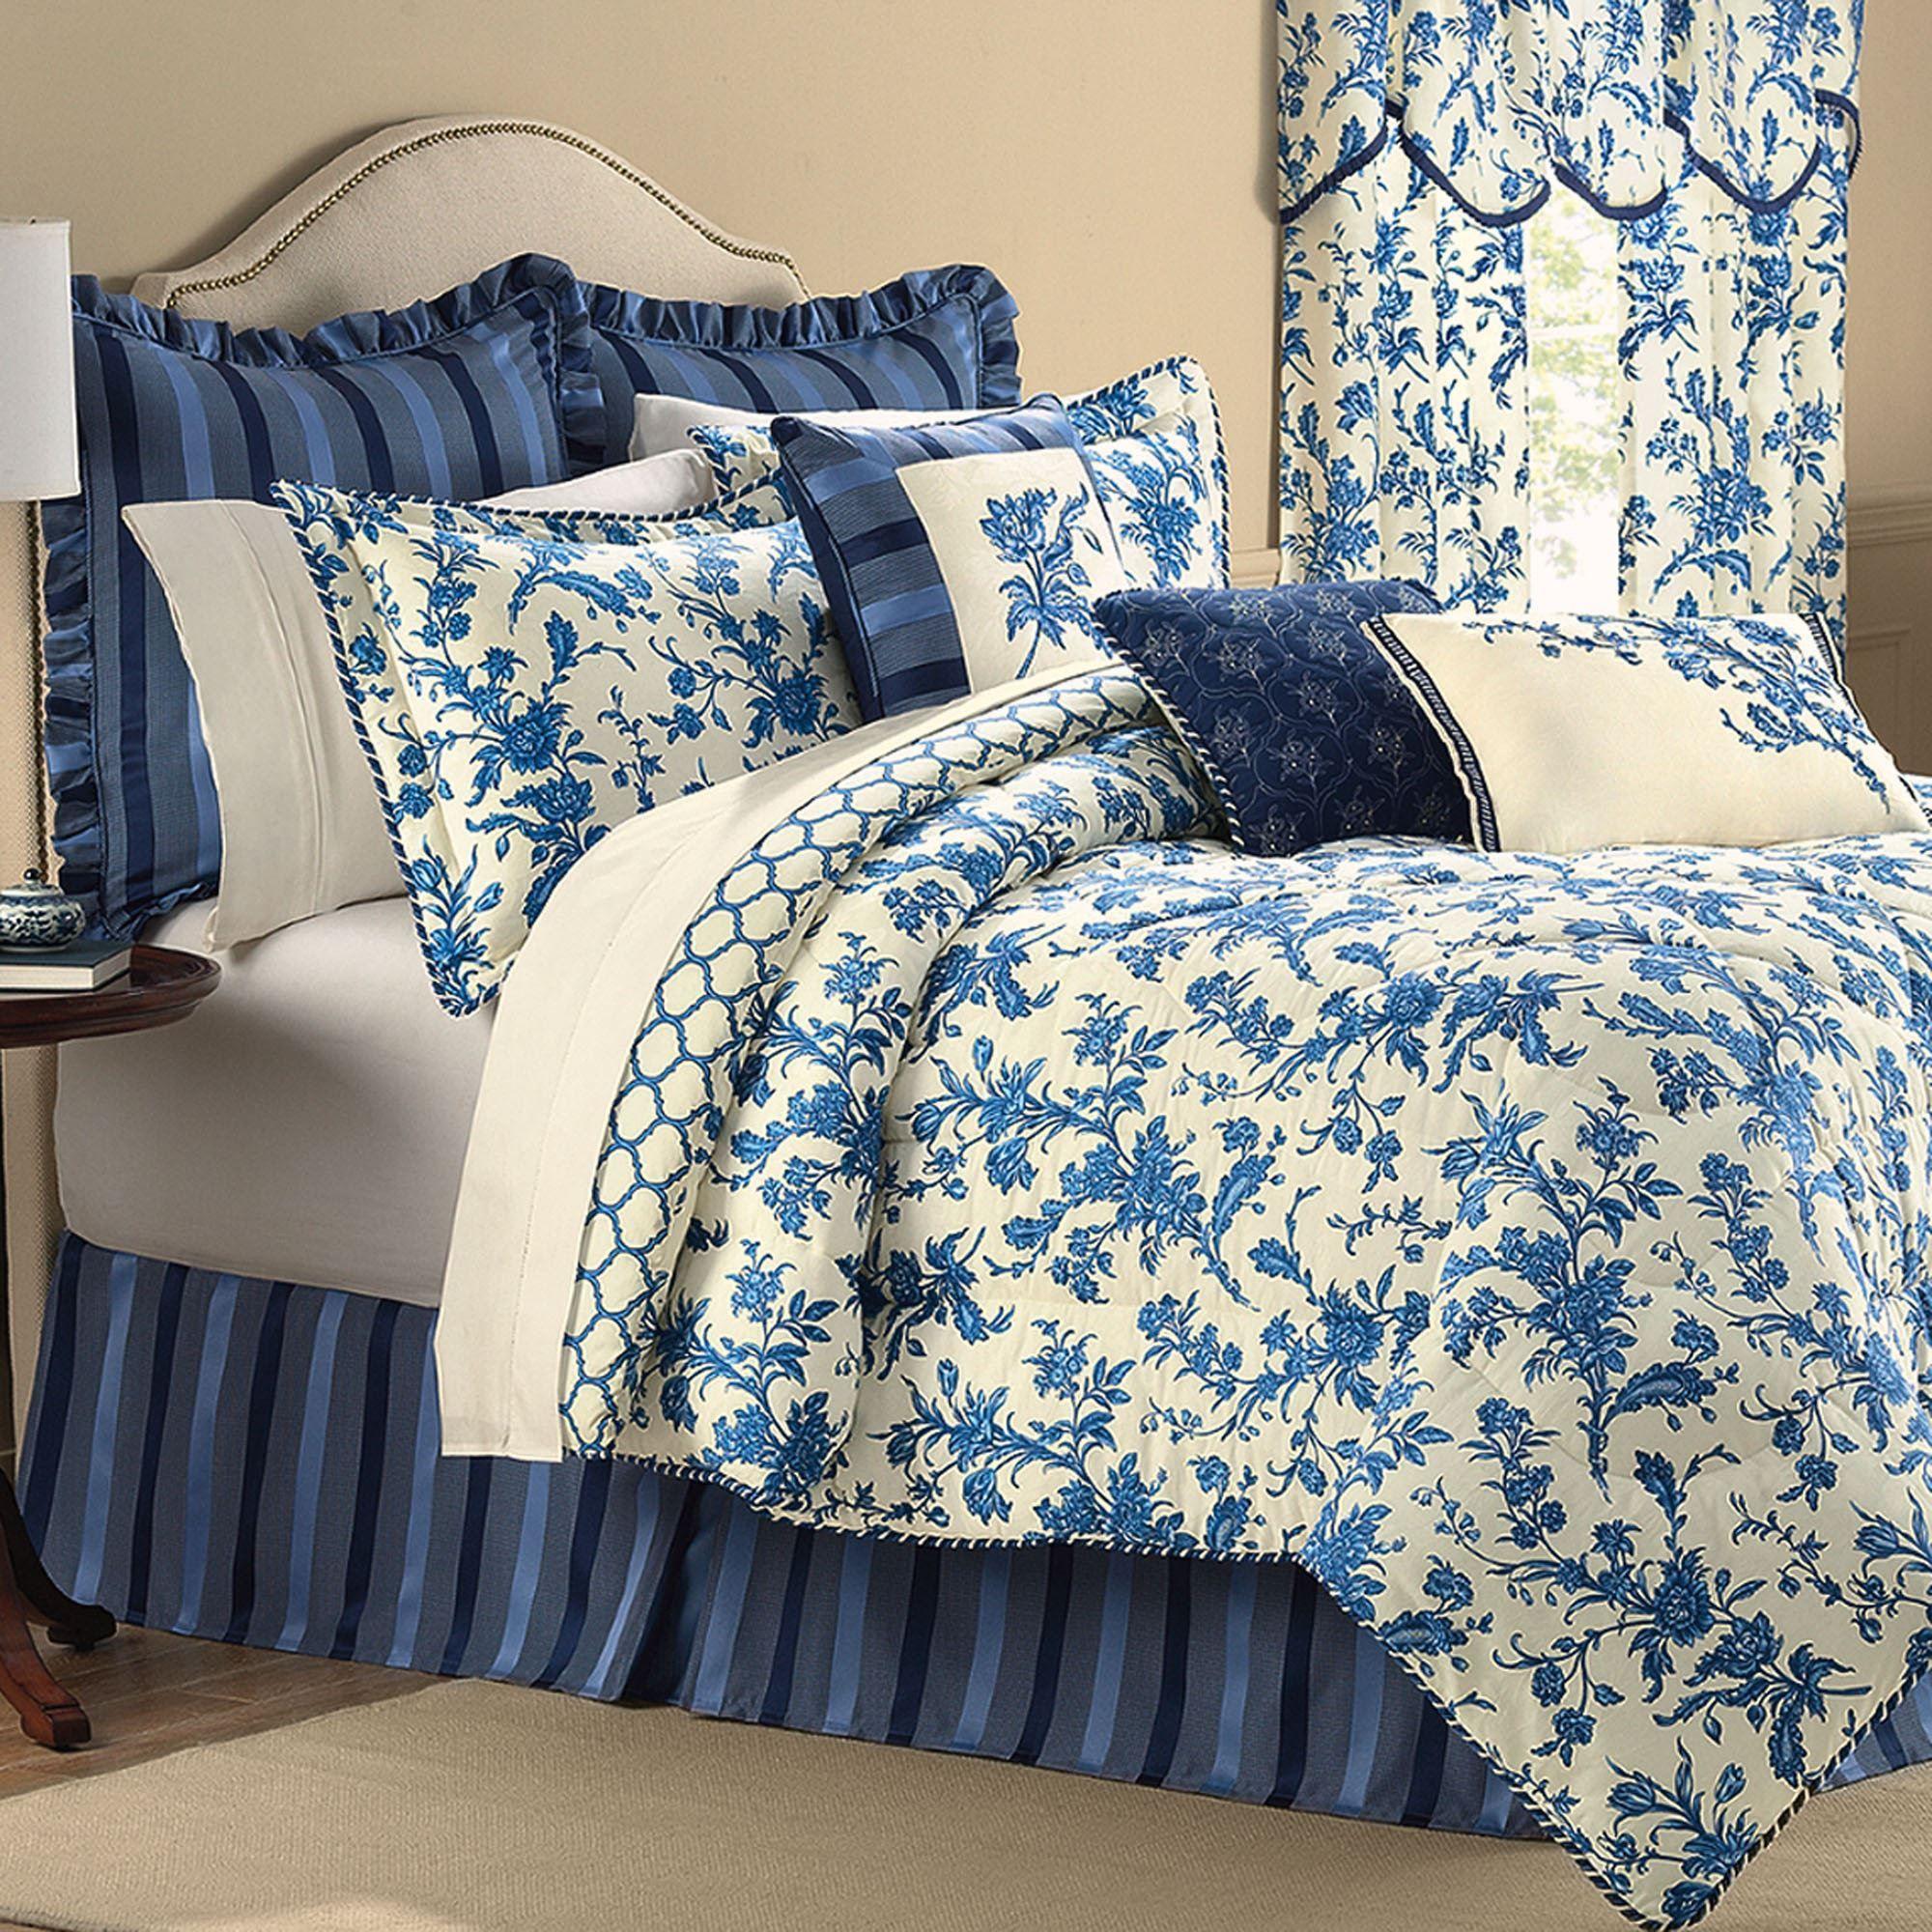 Spring Flowers Full Comforter Set Bedding in 2019 Постельное